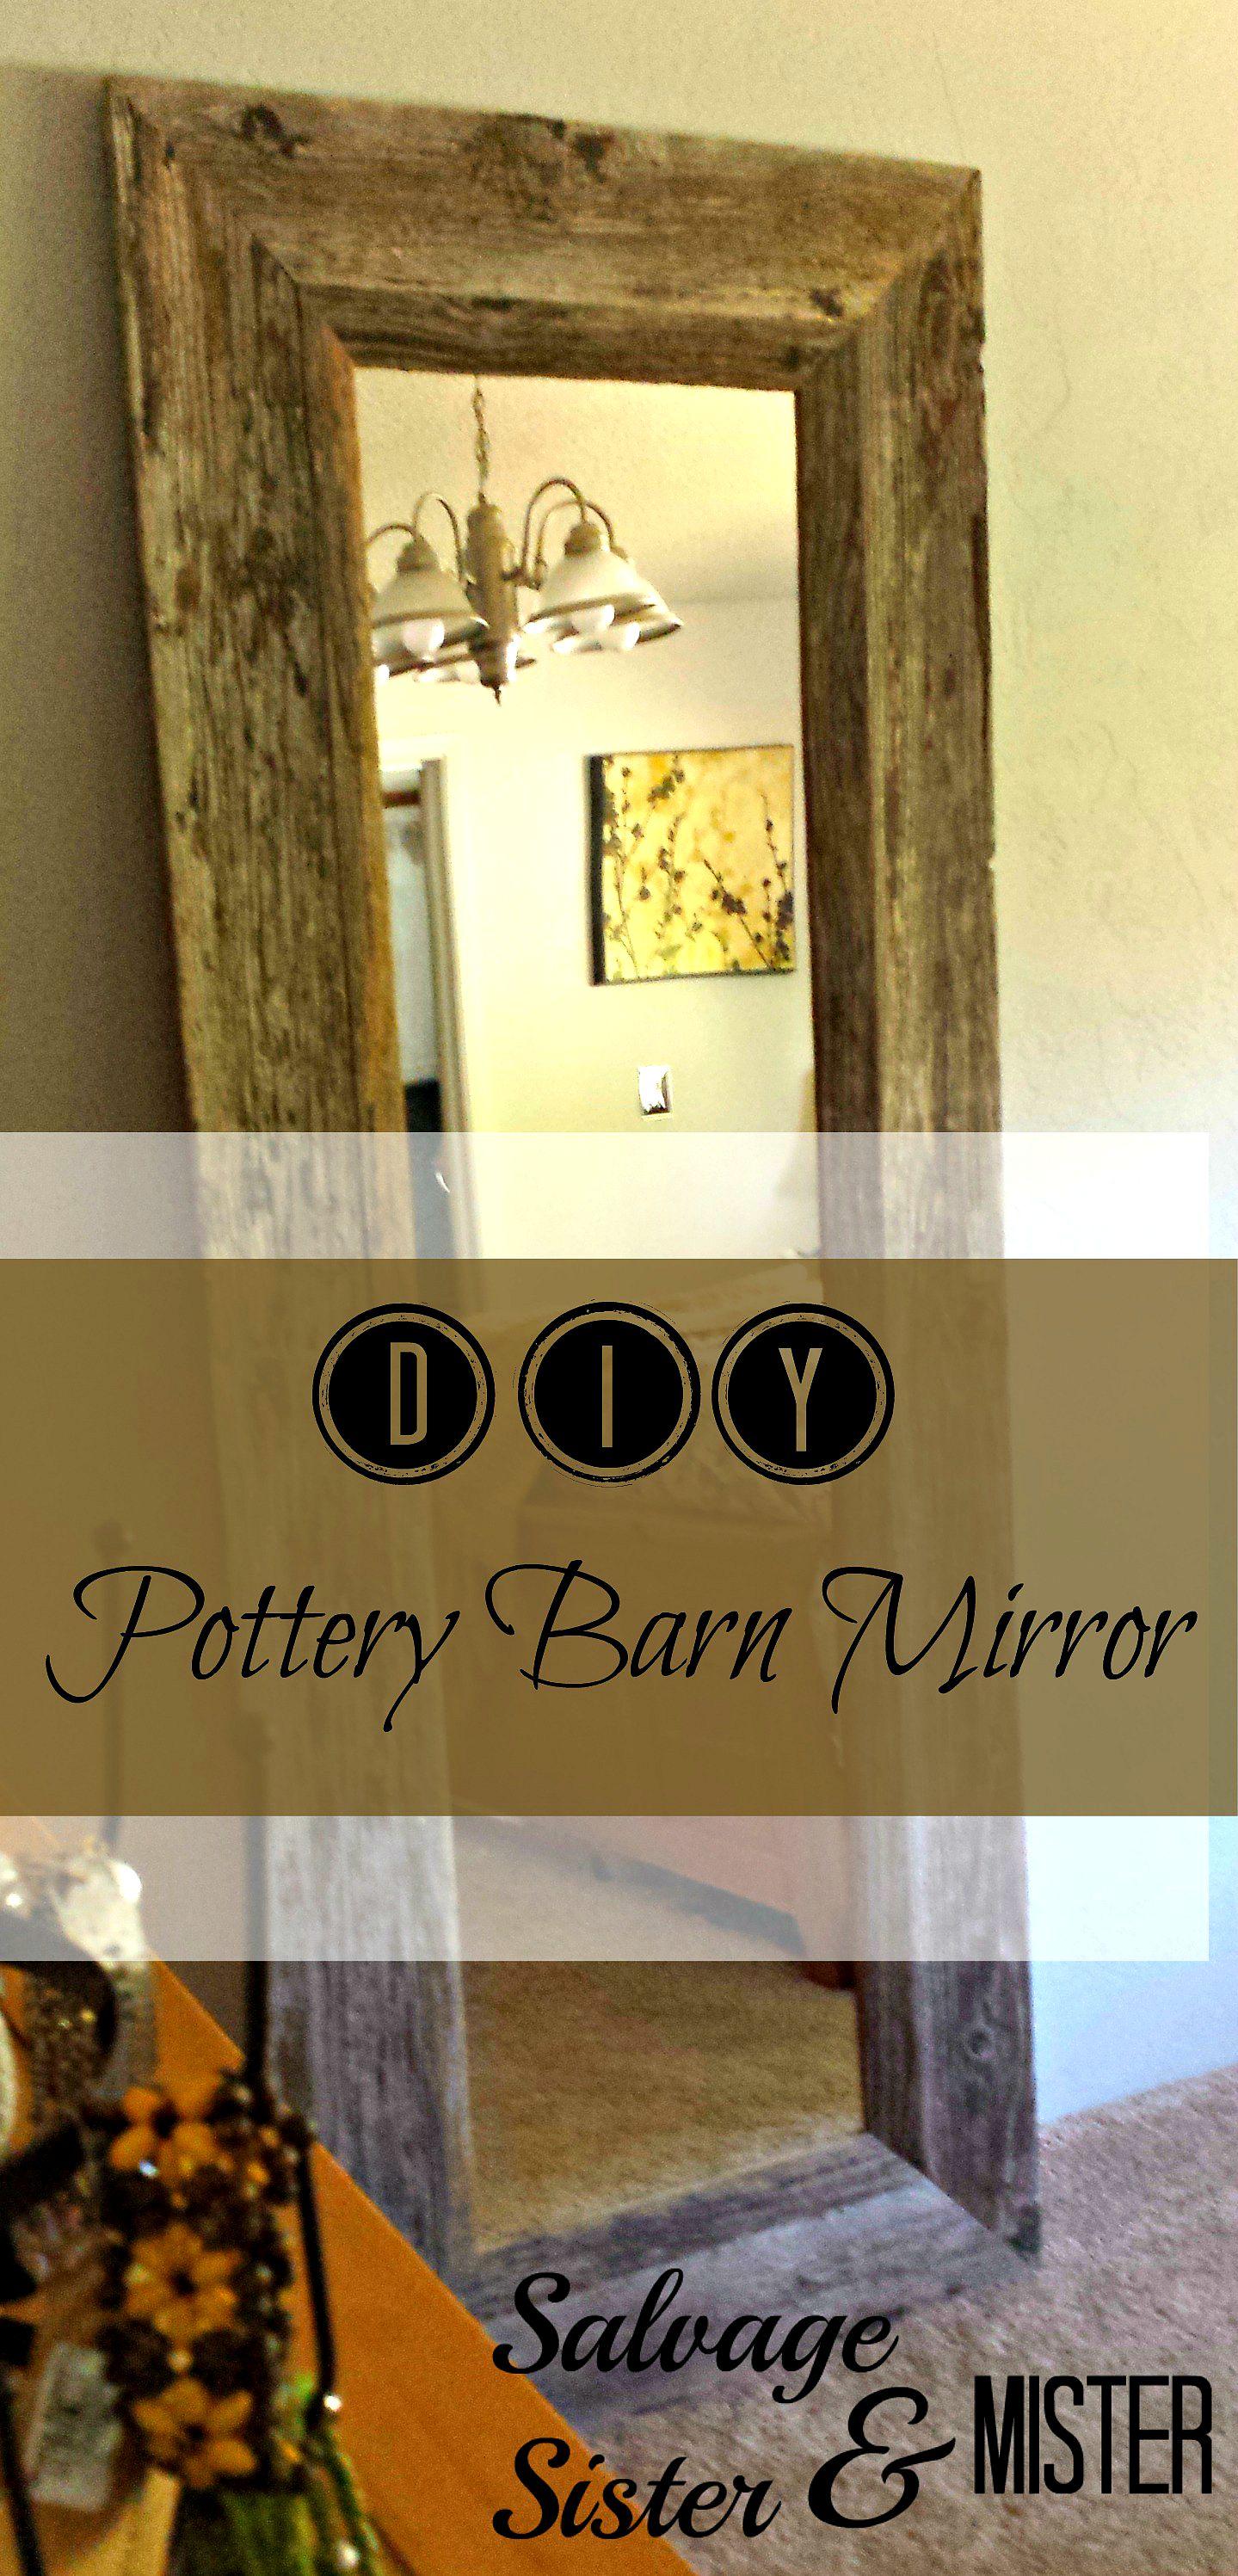 Barn Wood Mirror Rustic Home Decor: Crafting Trash Into Treasure